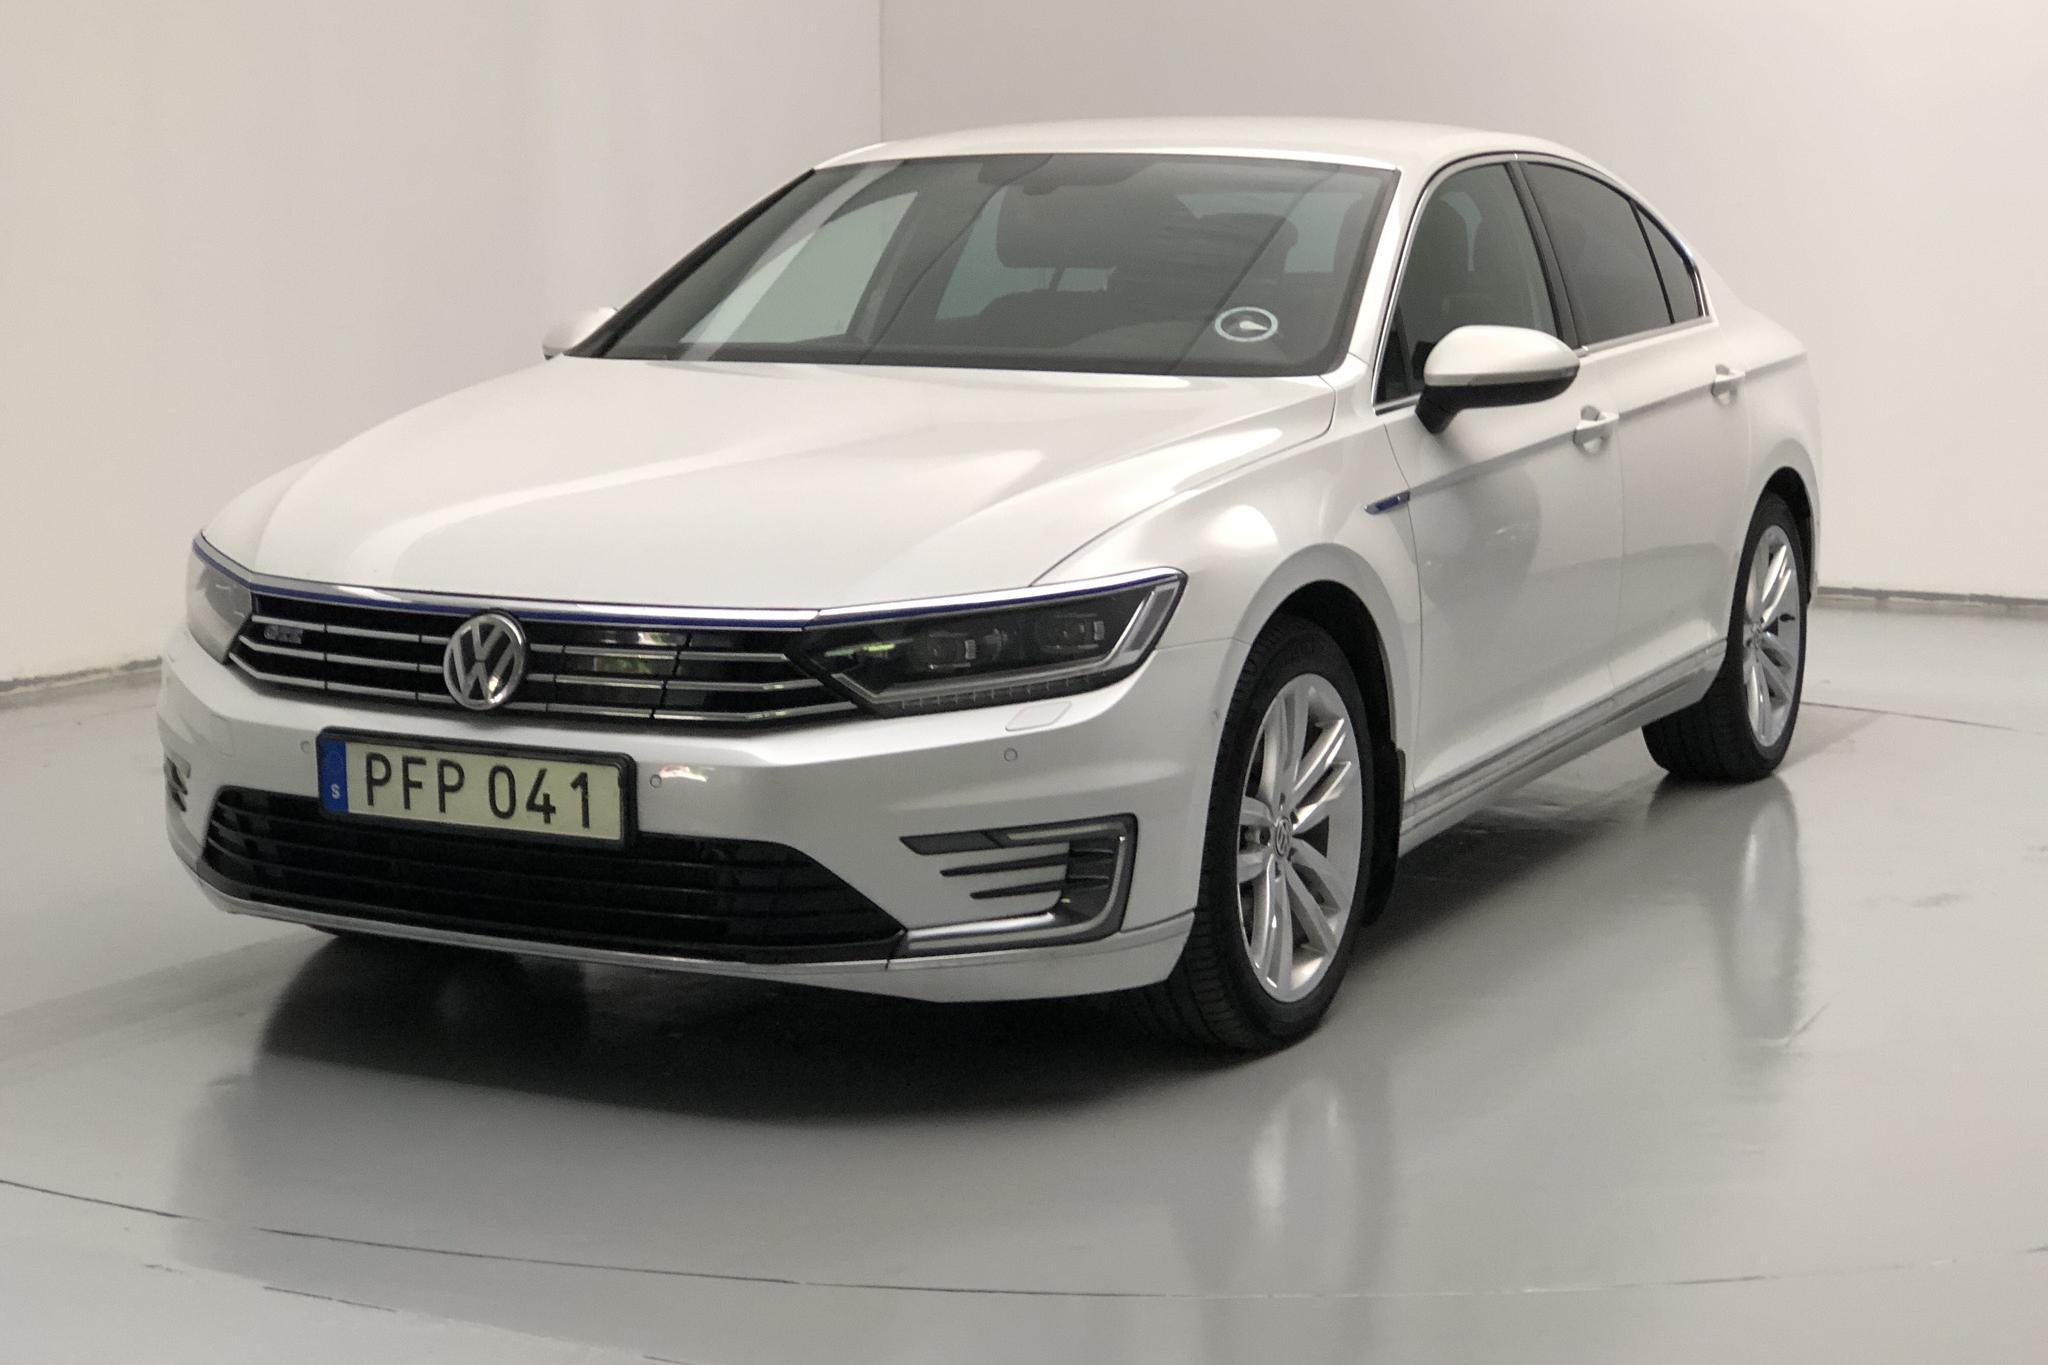 VW Passat 1.4 Plug-in-Hybrid (218hk)